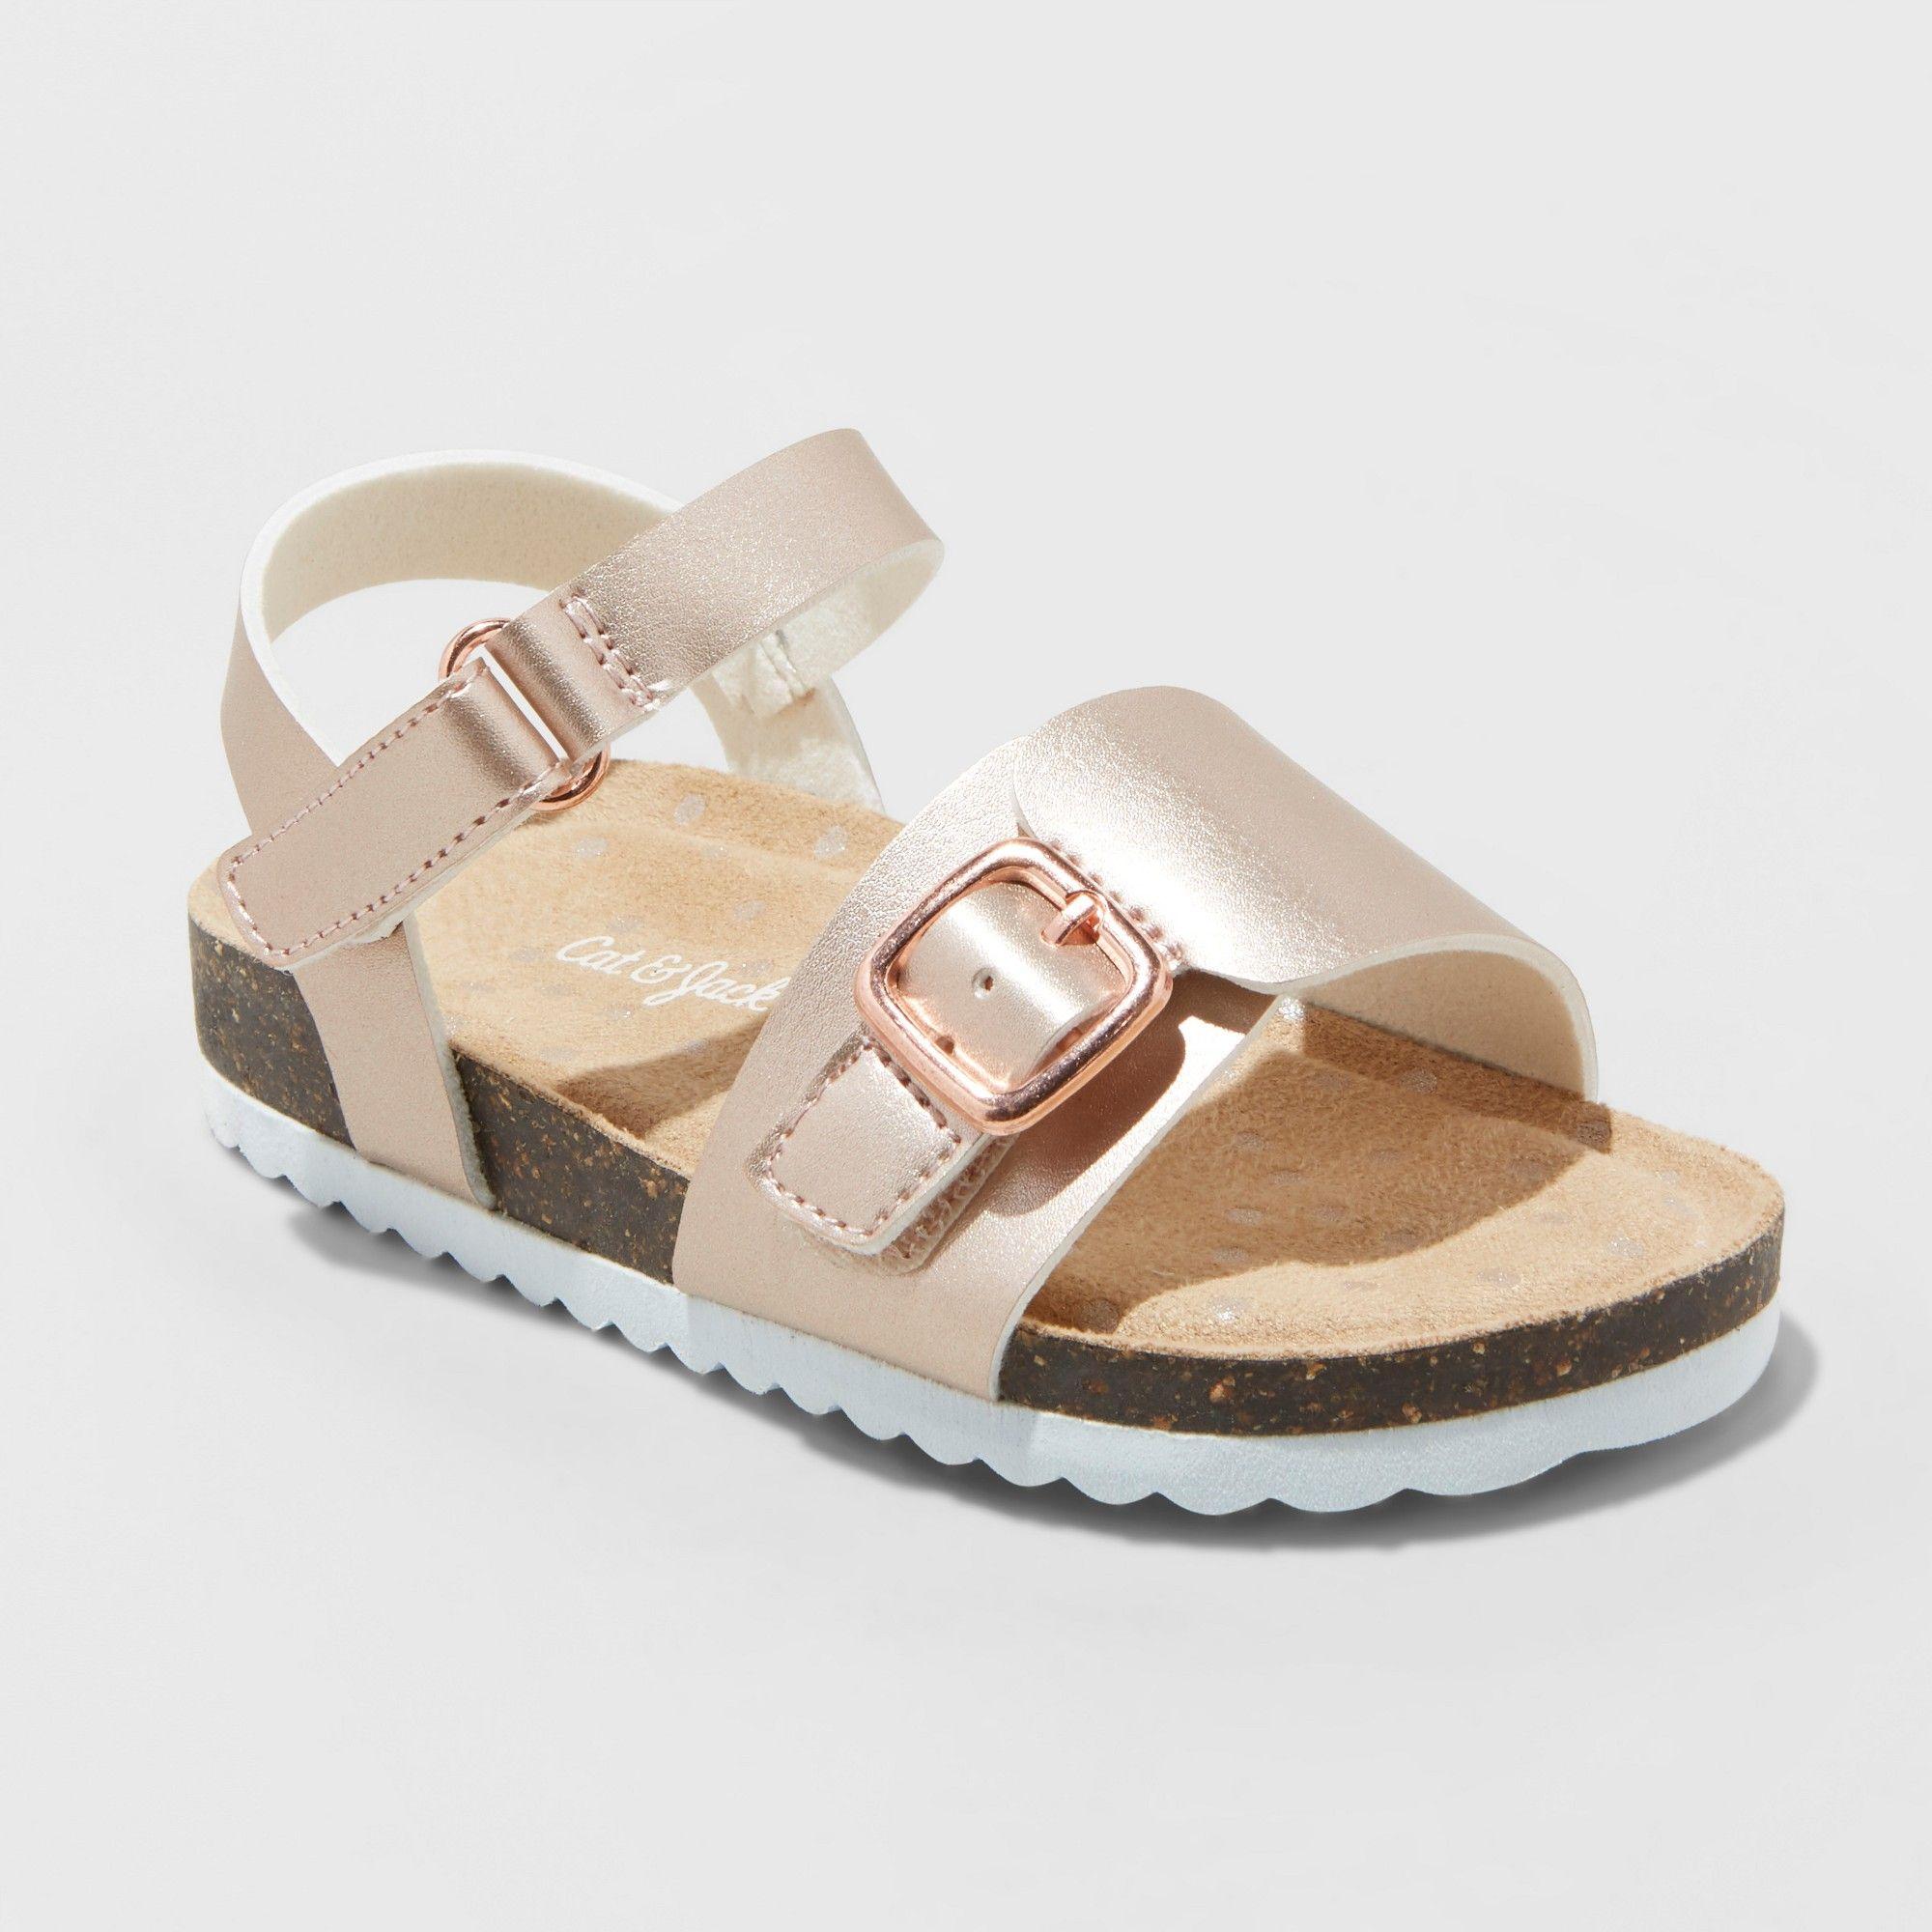 156d252ac8ec9 Toddler Girls  Berdie Comfort Footbed Sandals - Cat   Jack Rose Gold ...